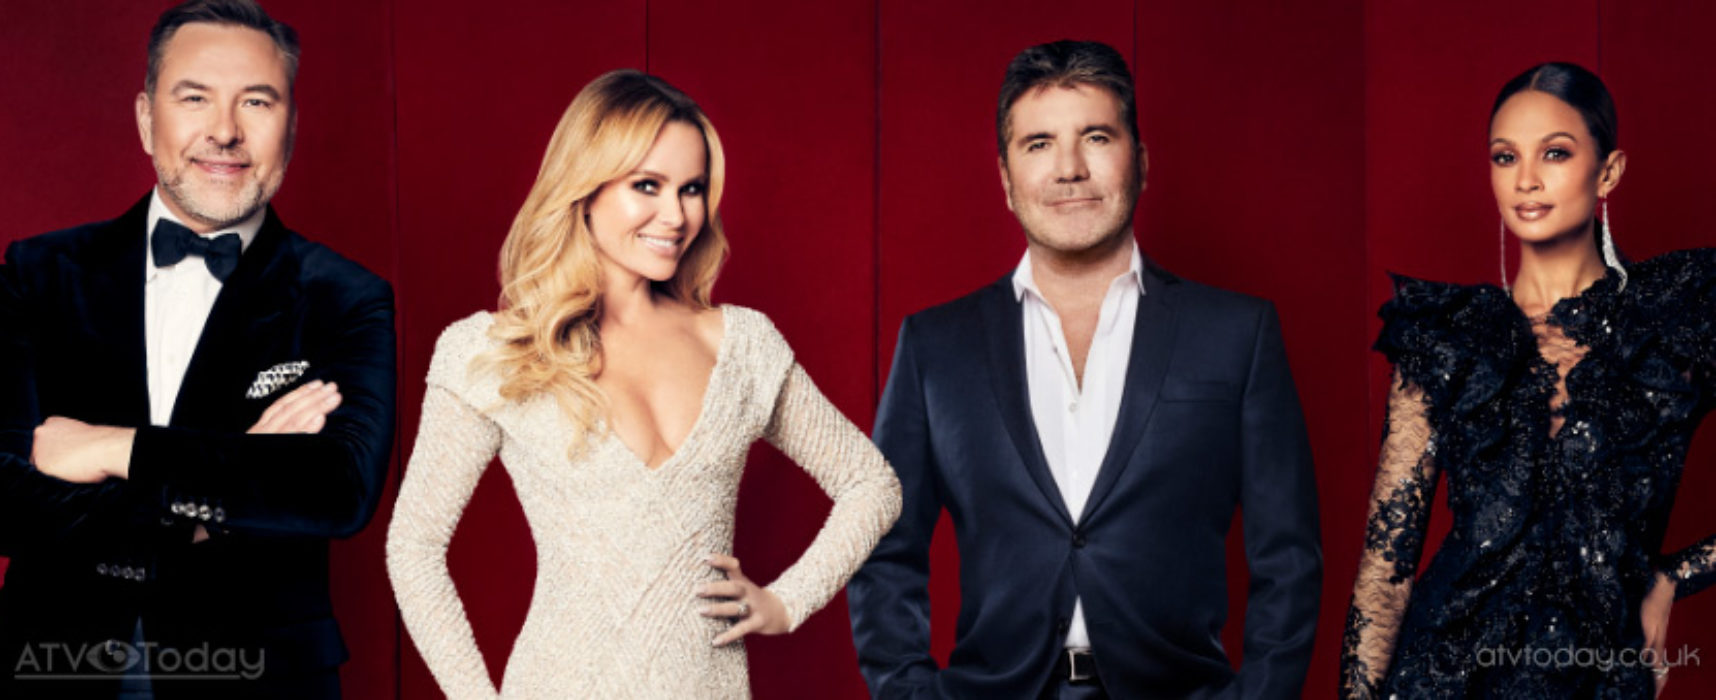 Britain's Got Talent – winners or wacky wagers?